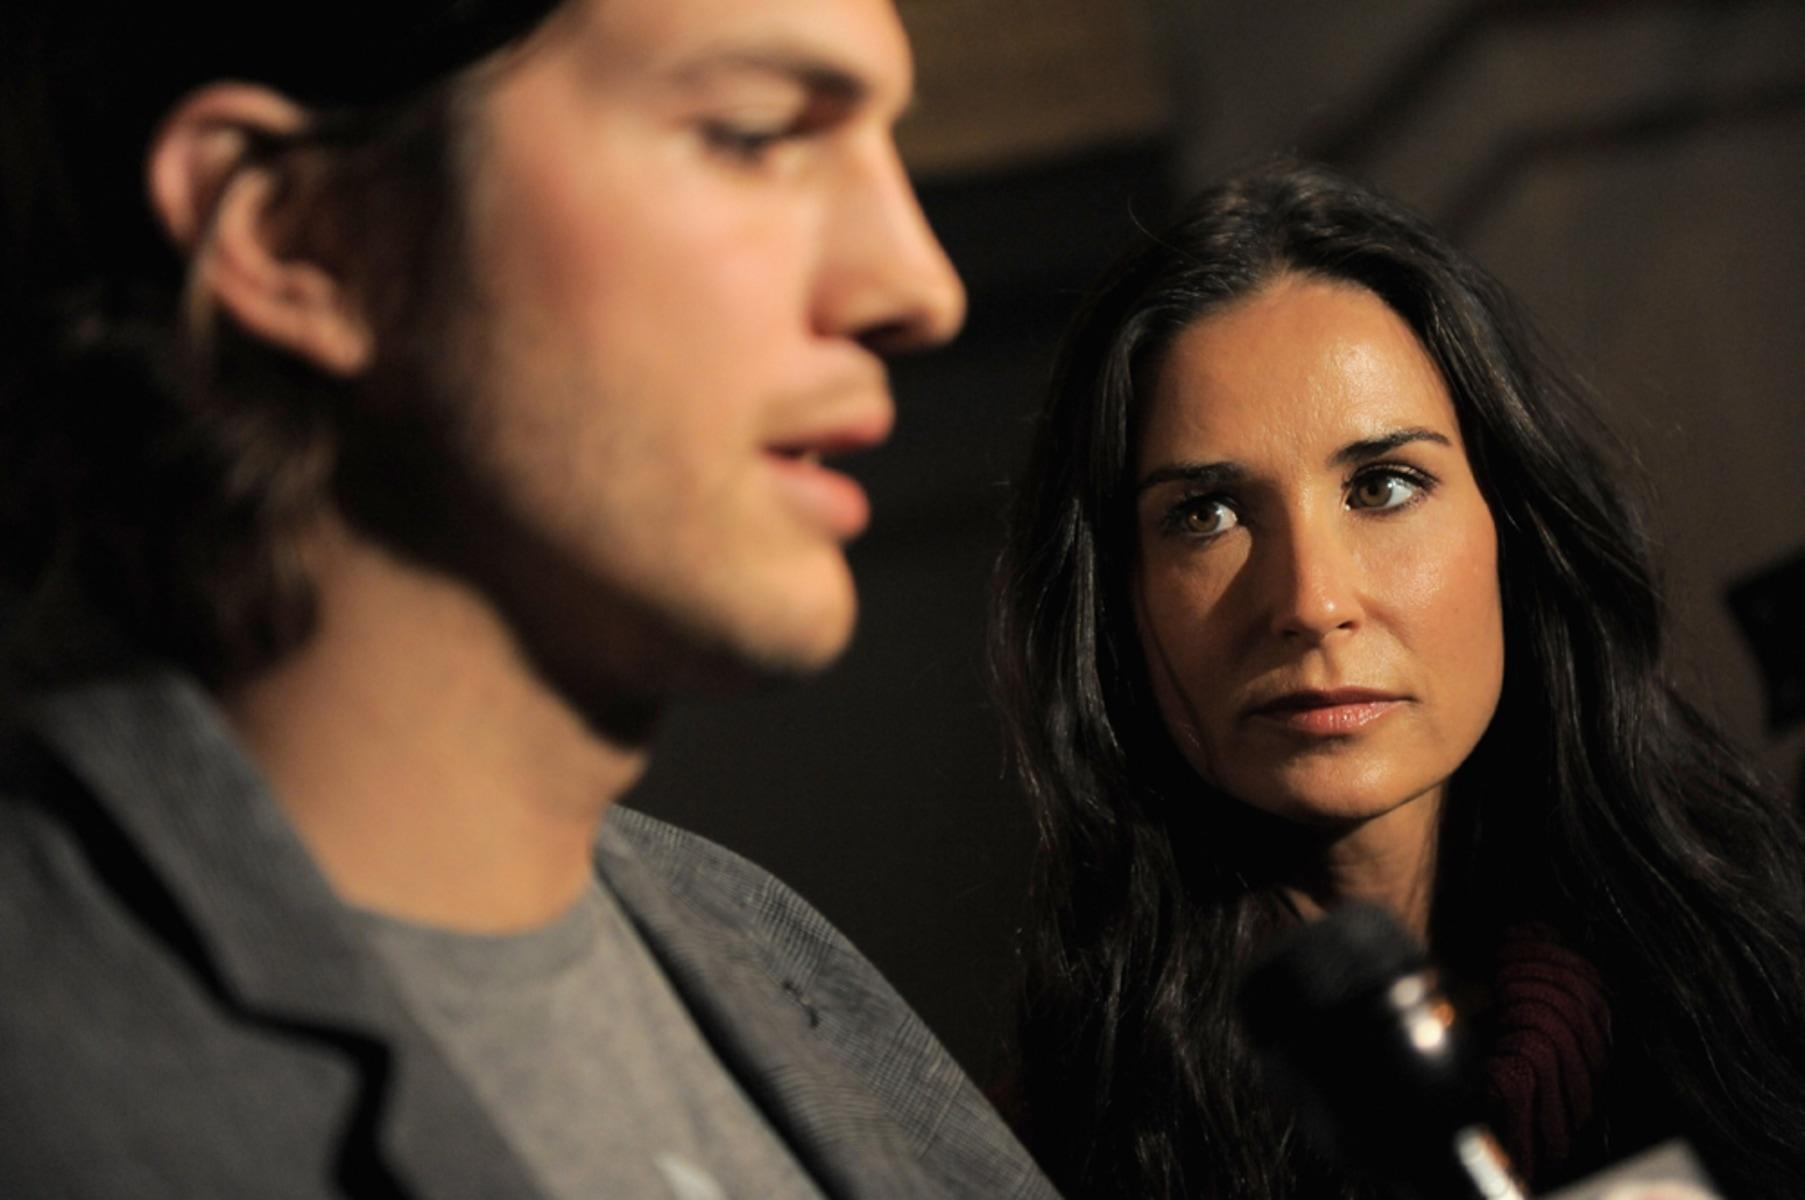 Image: Demi Moore and Ashton Kutcher